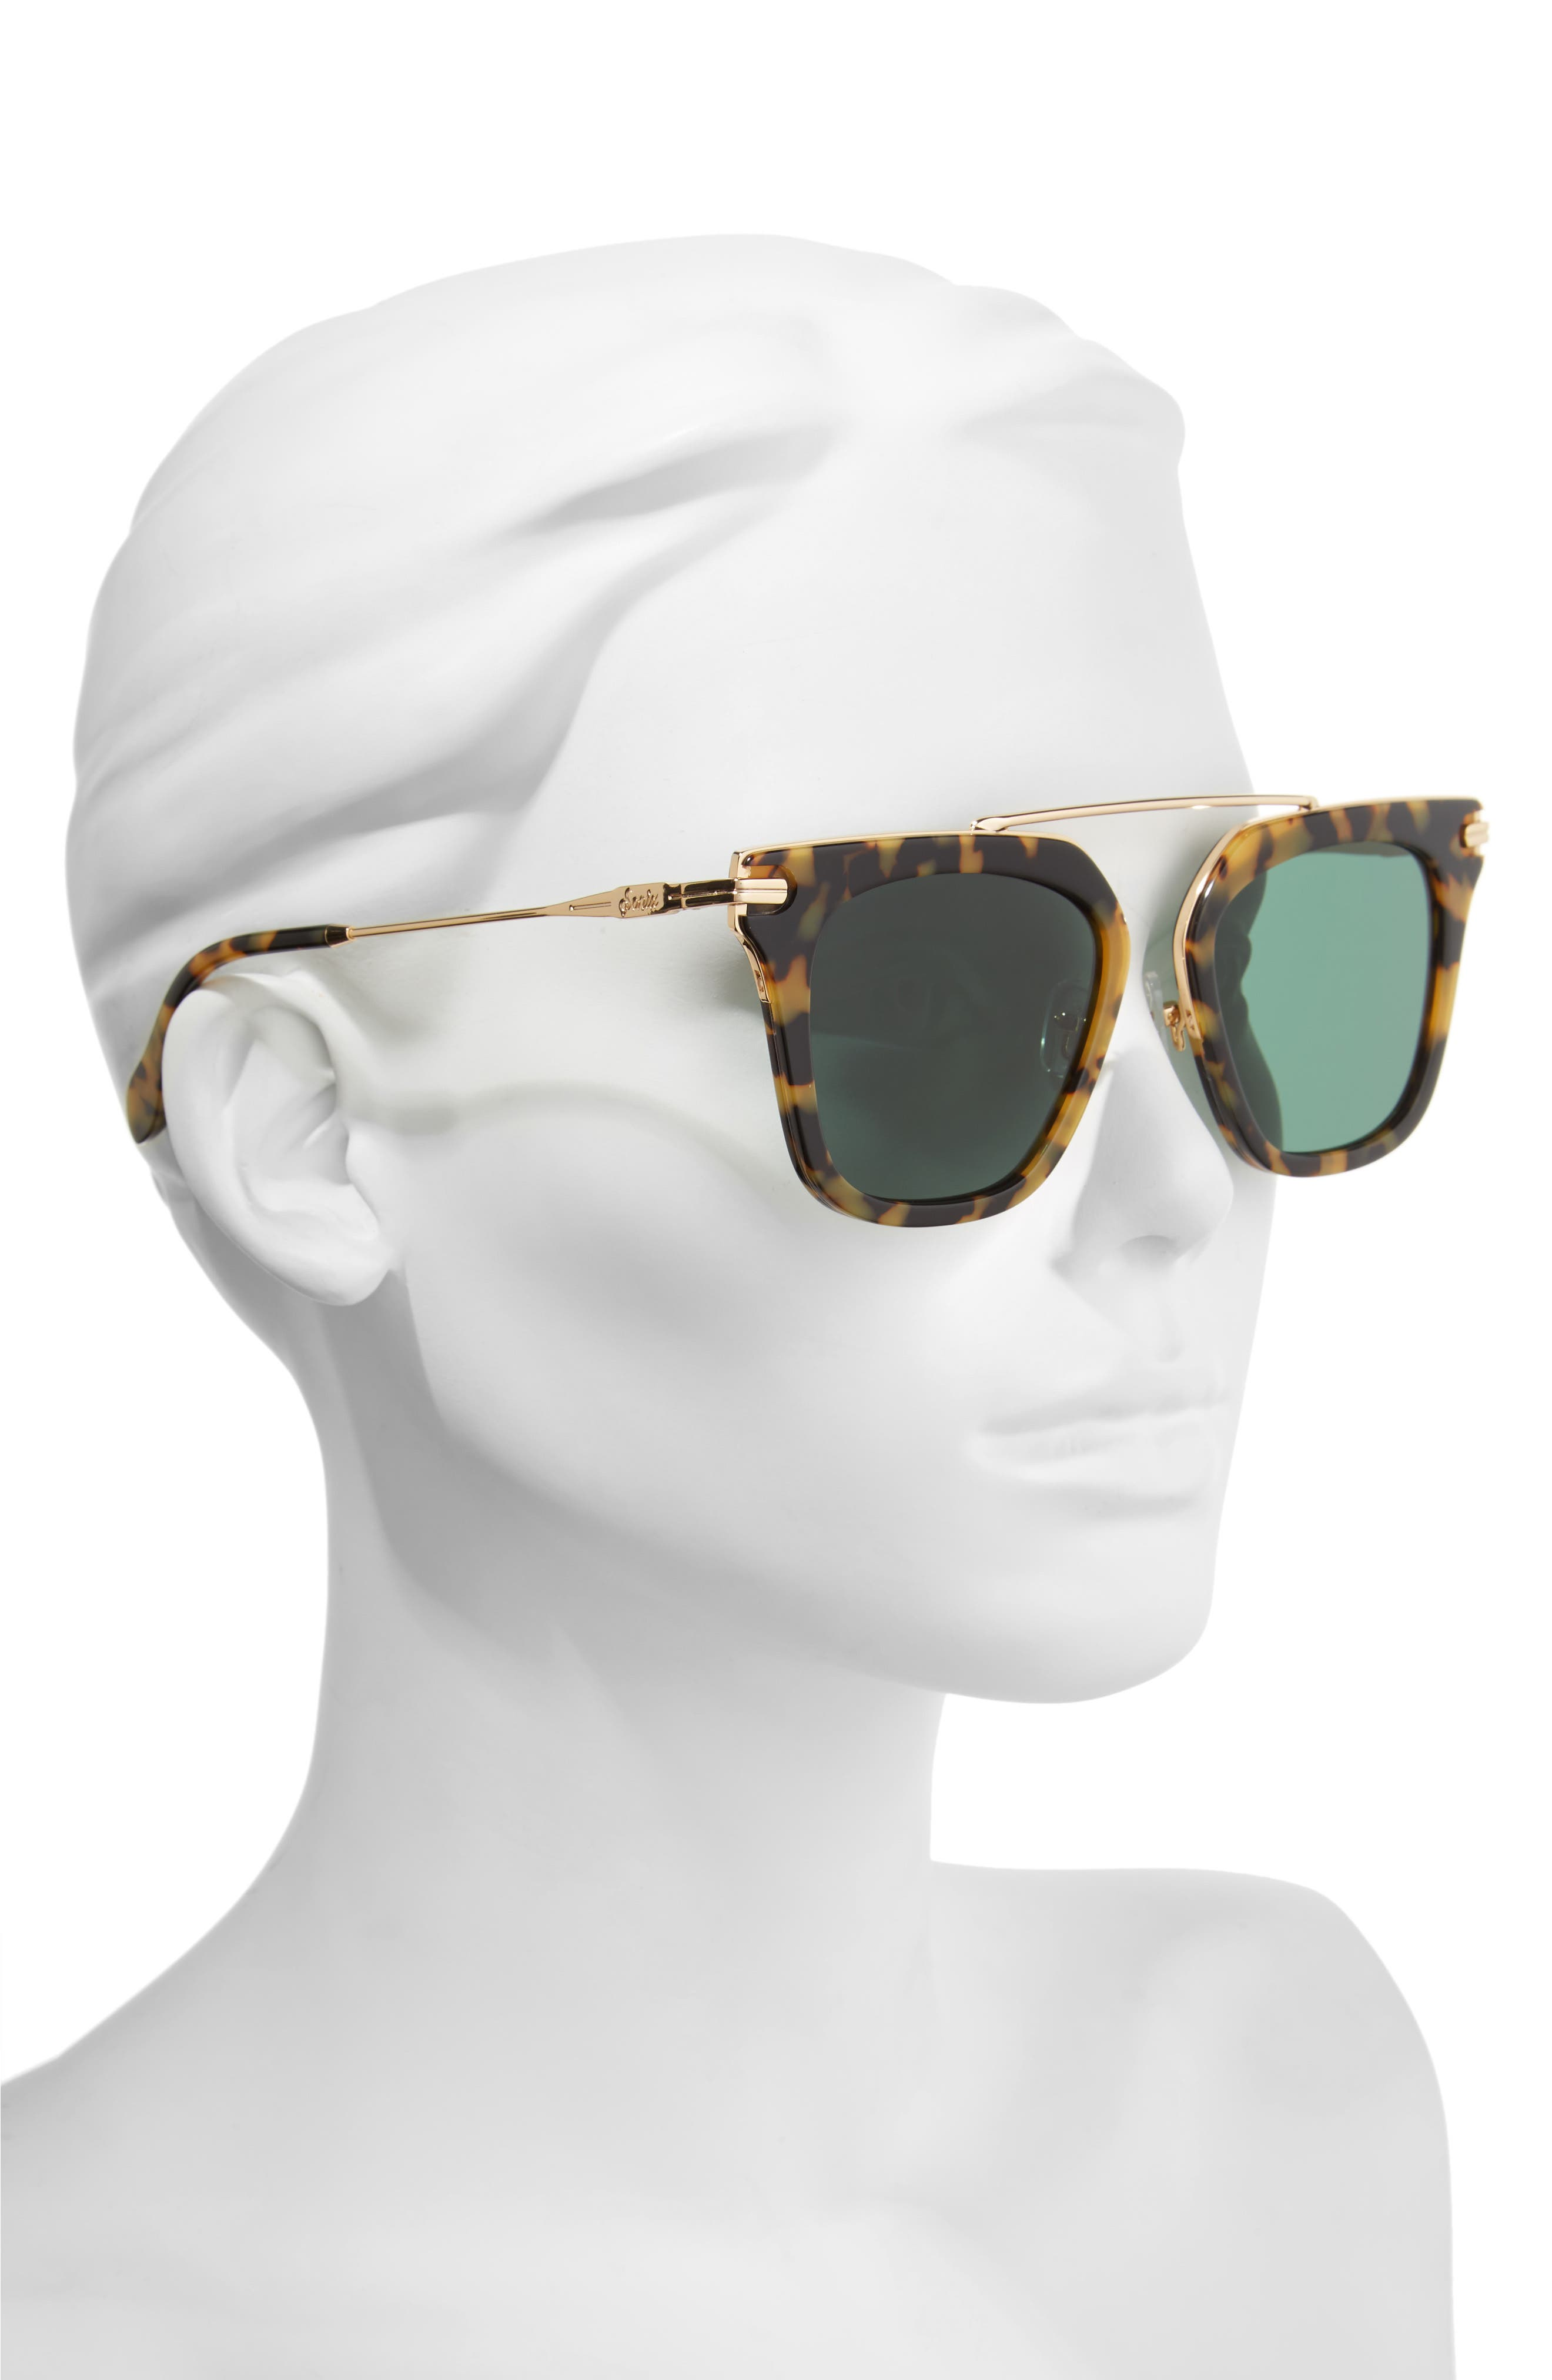 Parker 50mm Sunglasses,                             Alternate thumbnail 2, color,                             Caramel Tortoise/ Green Solid